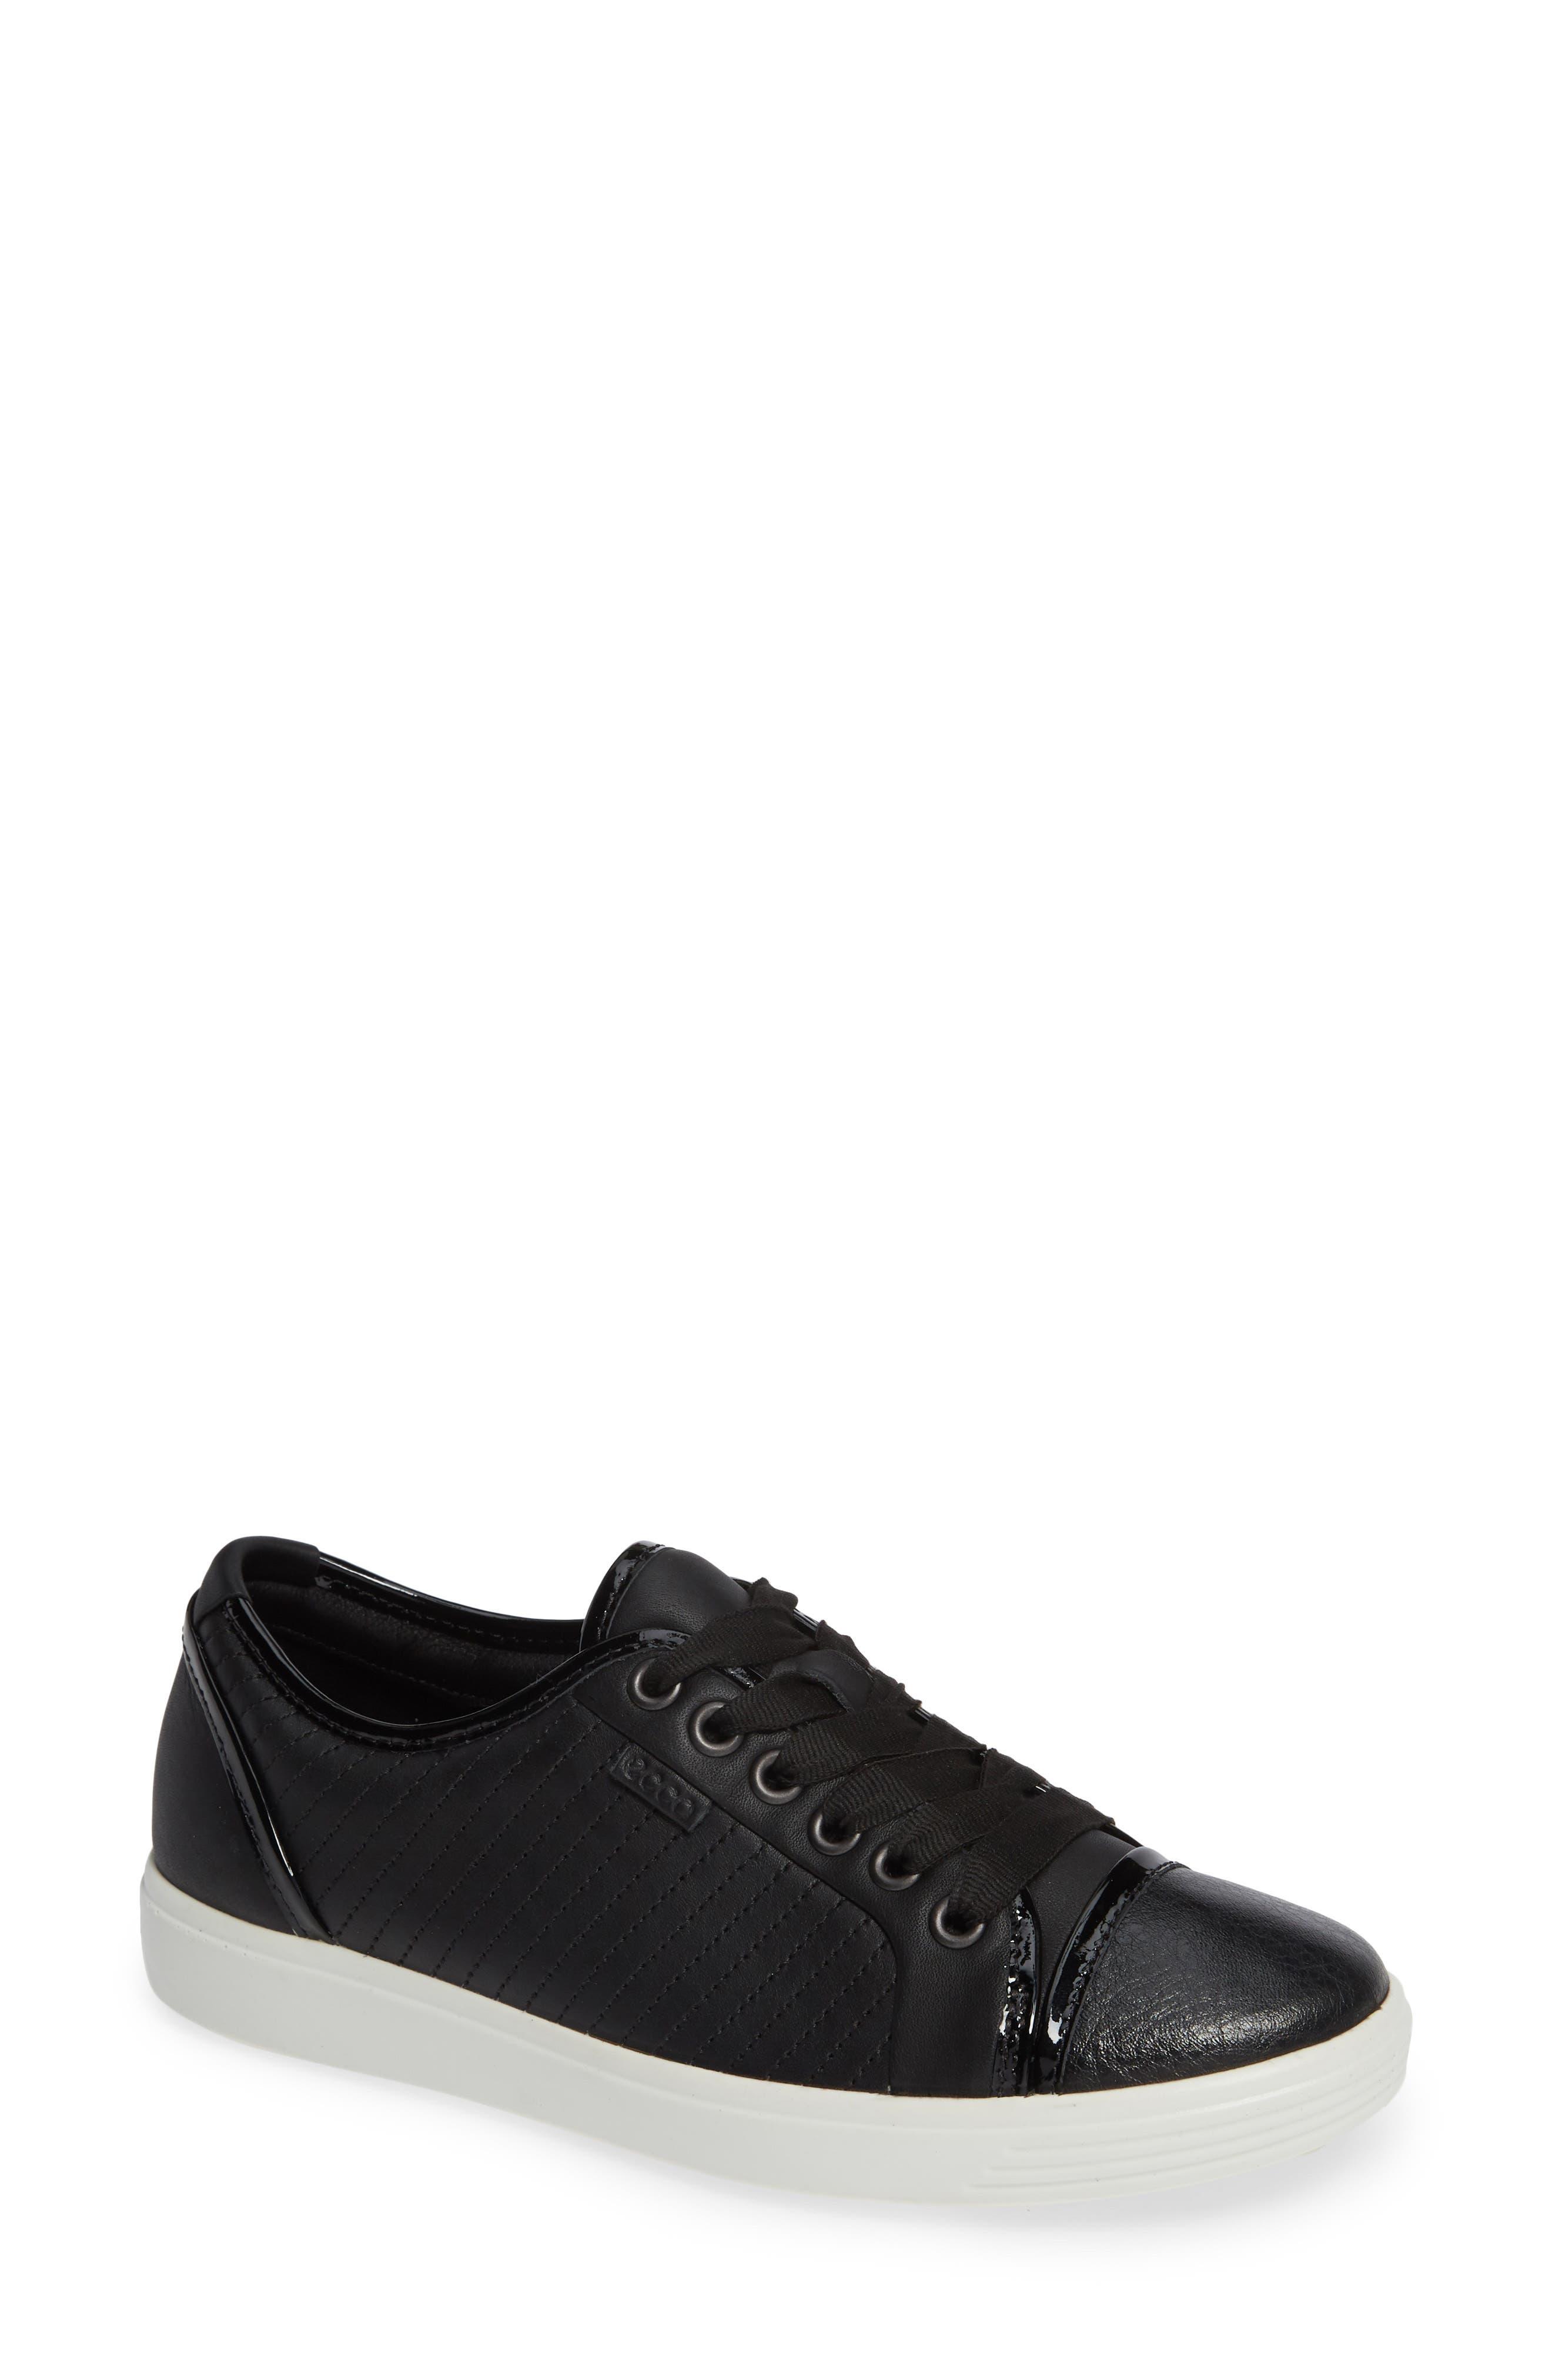 Soft 7 Cap Toe Sneaker, Main, color, BLACK LEATHER